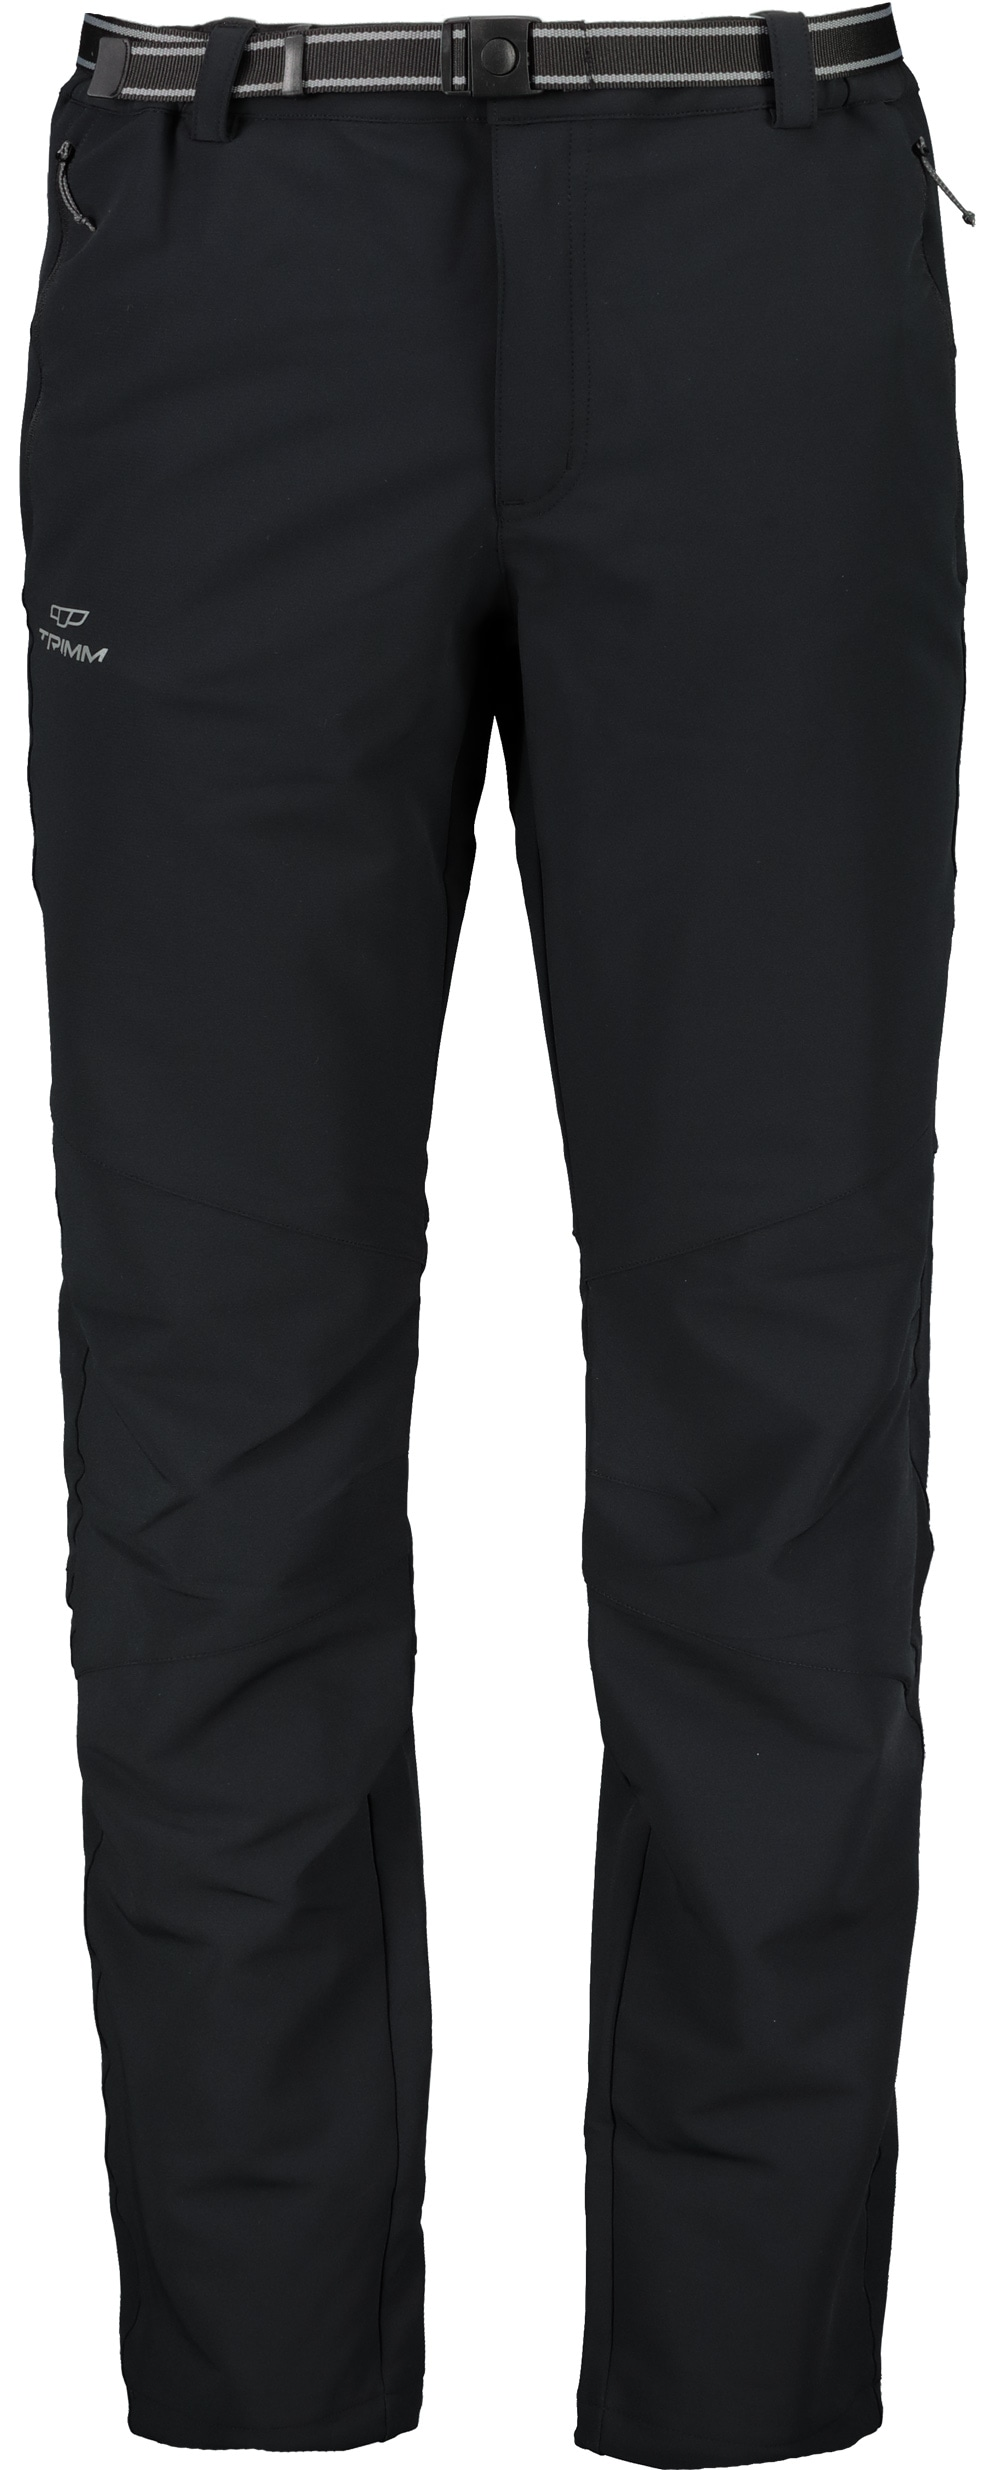 Kalhoty outdoorové unisex TRIMM CALDO